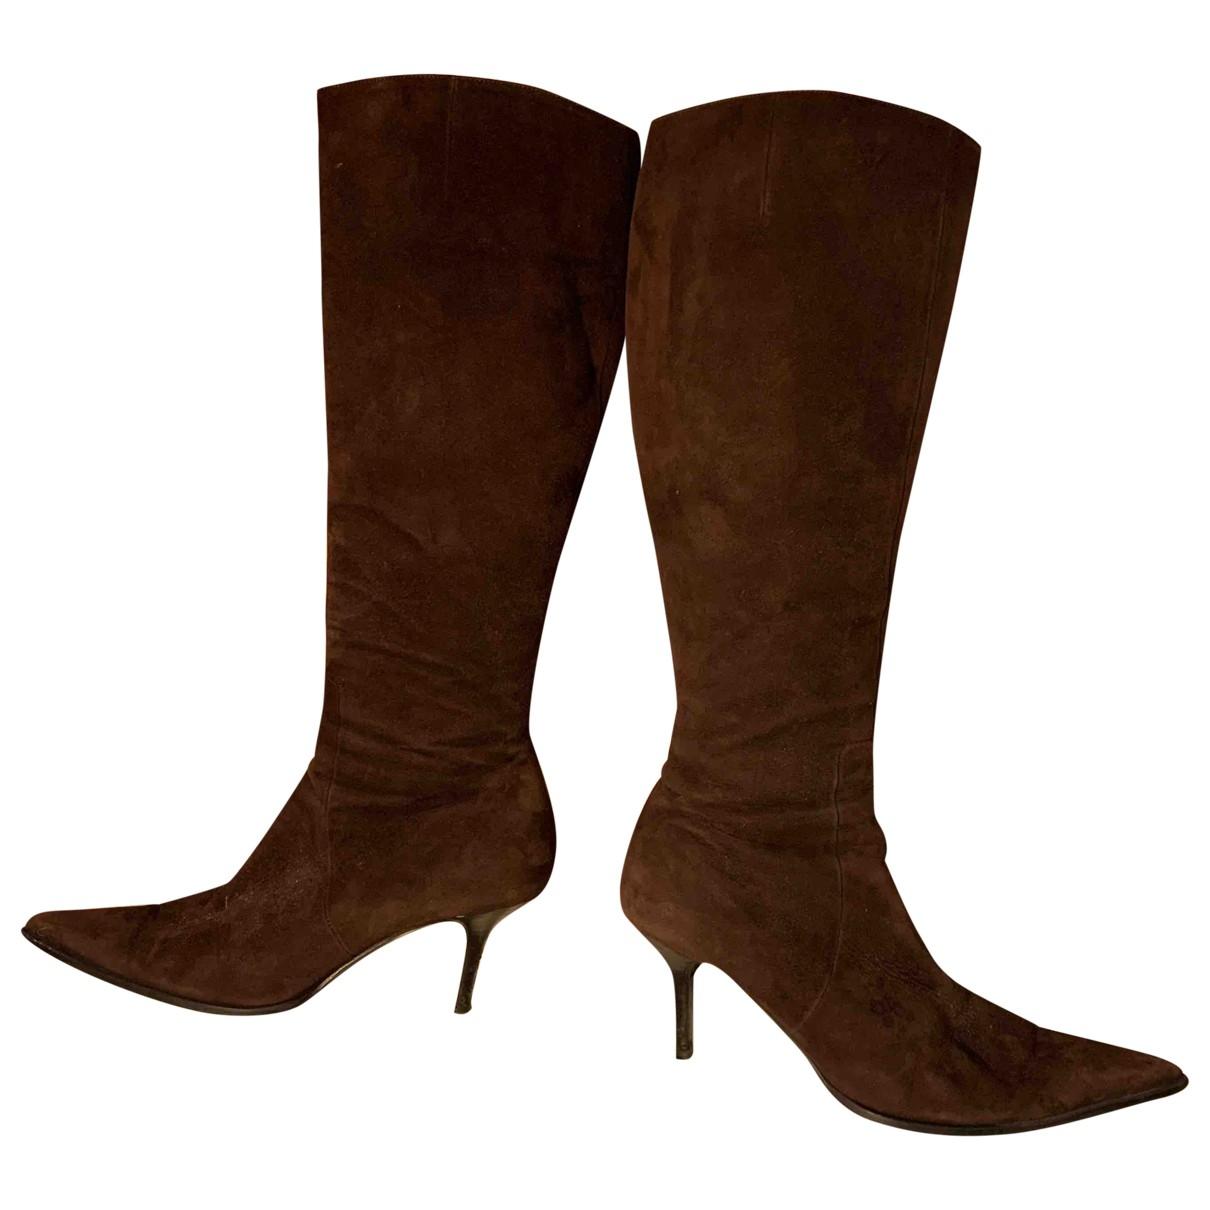 Jaime Mascaro \N Brown Suede Boots for Women 39 EU